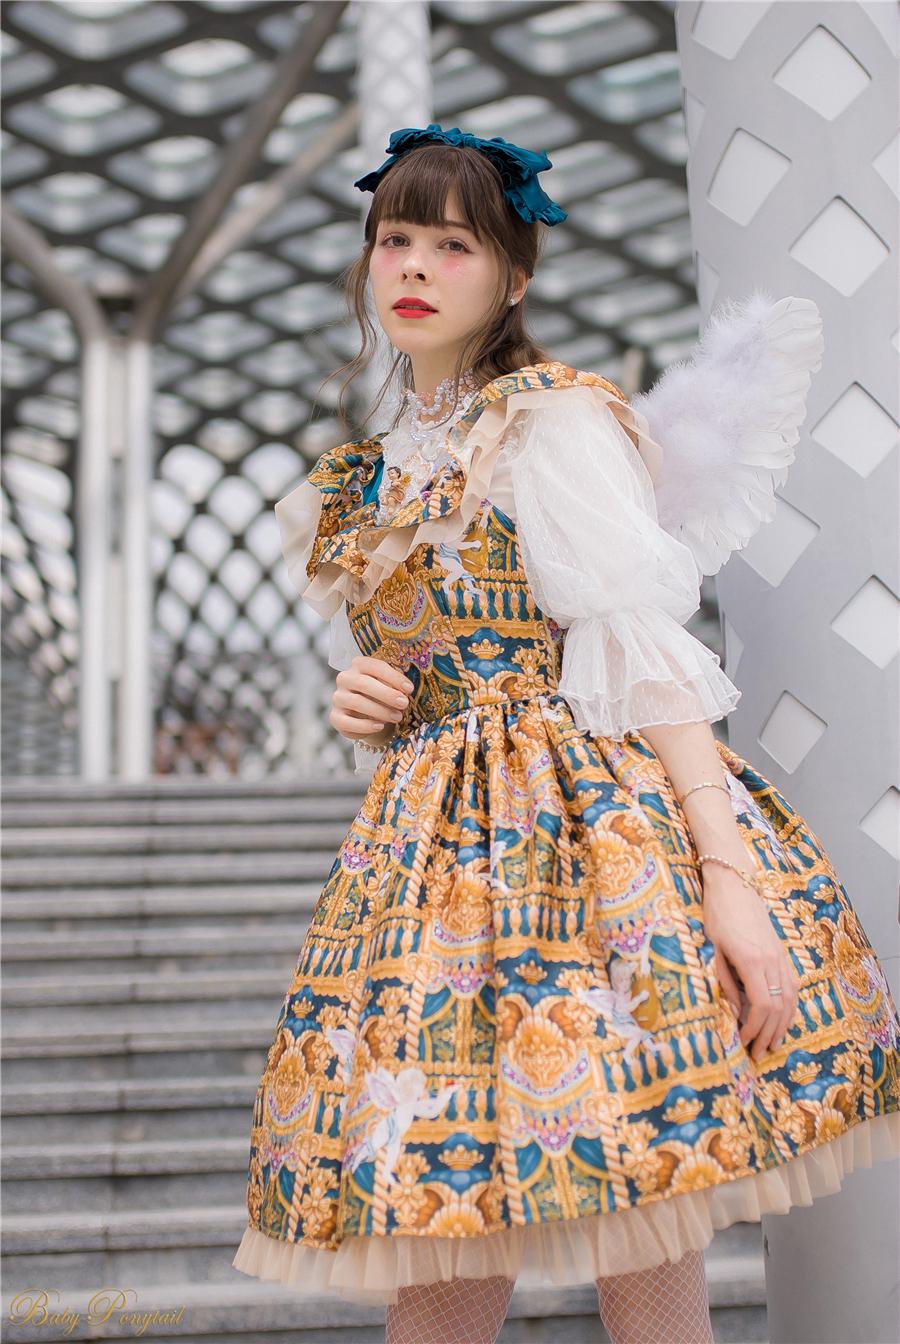 Babyponytail_Model_Ruffle Collar JSK_Tiel Angel_2_Claudia_2.jpg